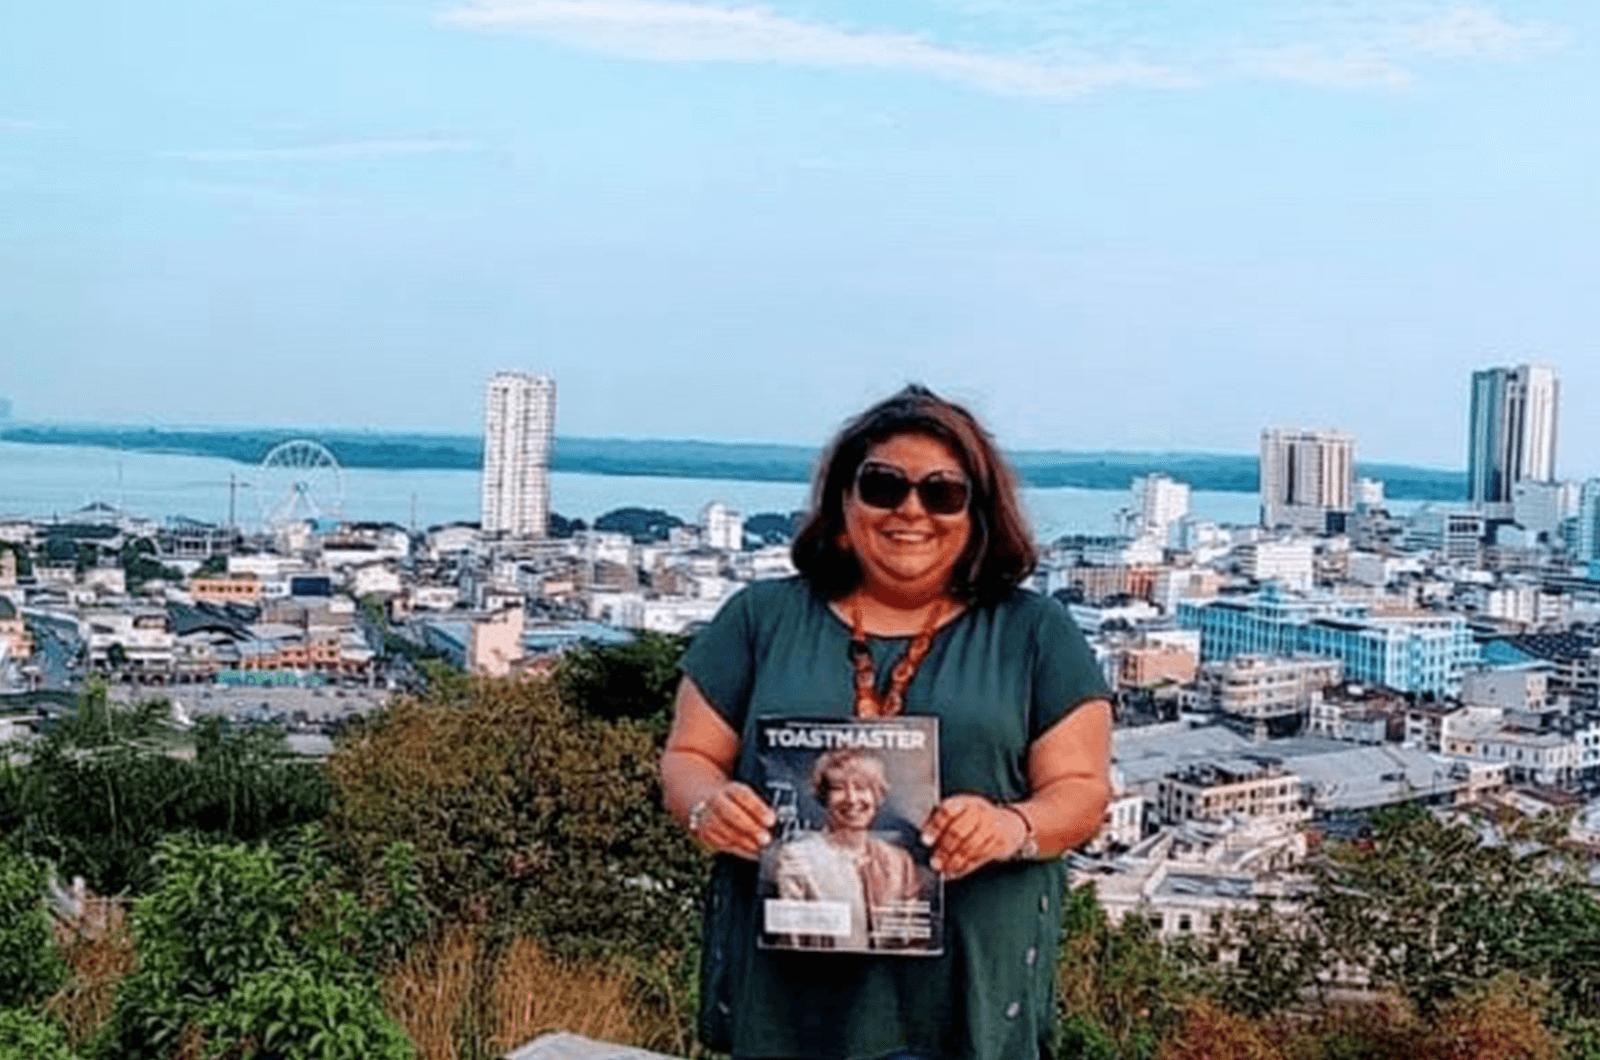 Pamela Benson of Denver, Colorado, looks over Guayaquil, Ecuador, from Cerro Del Carmen—a popular place to view the city.